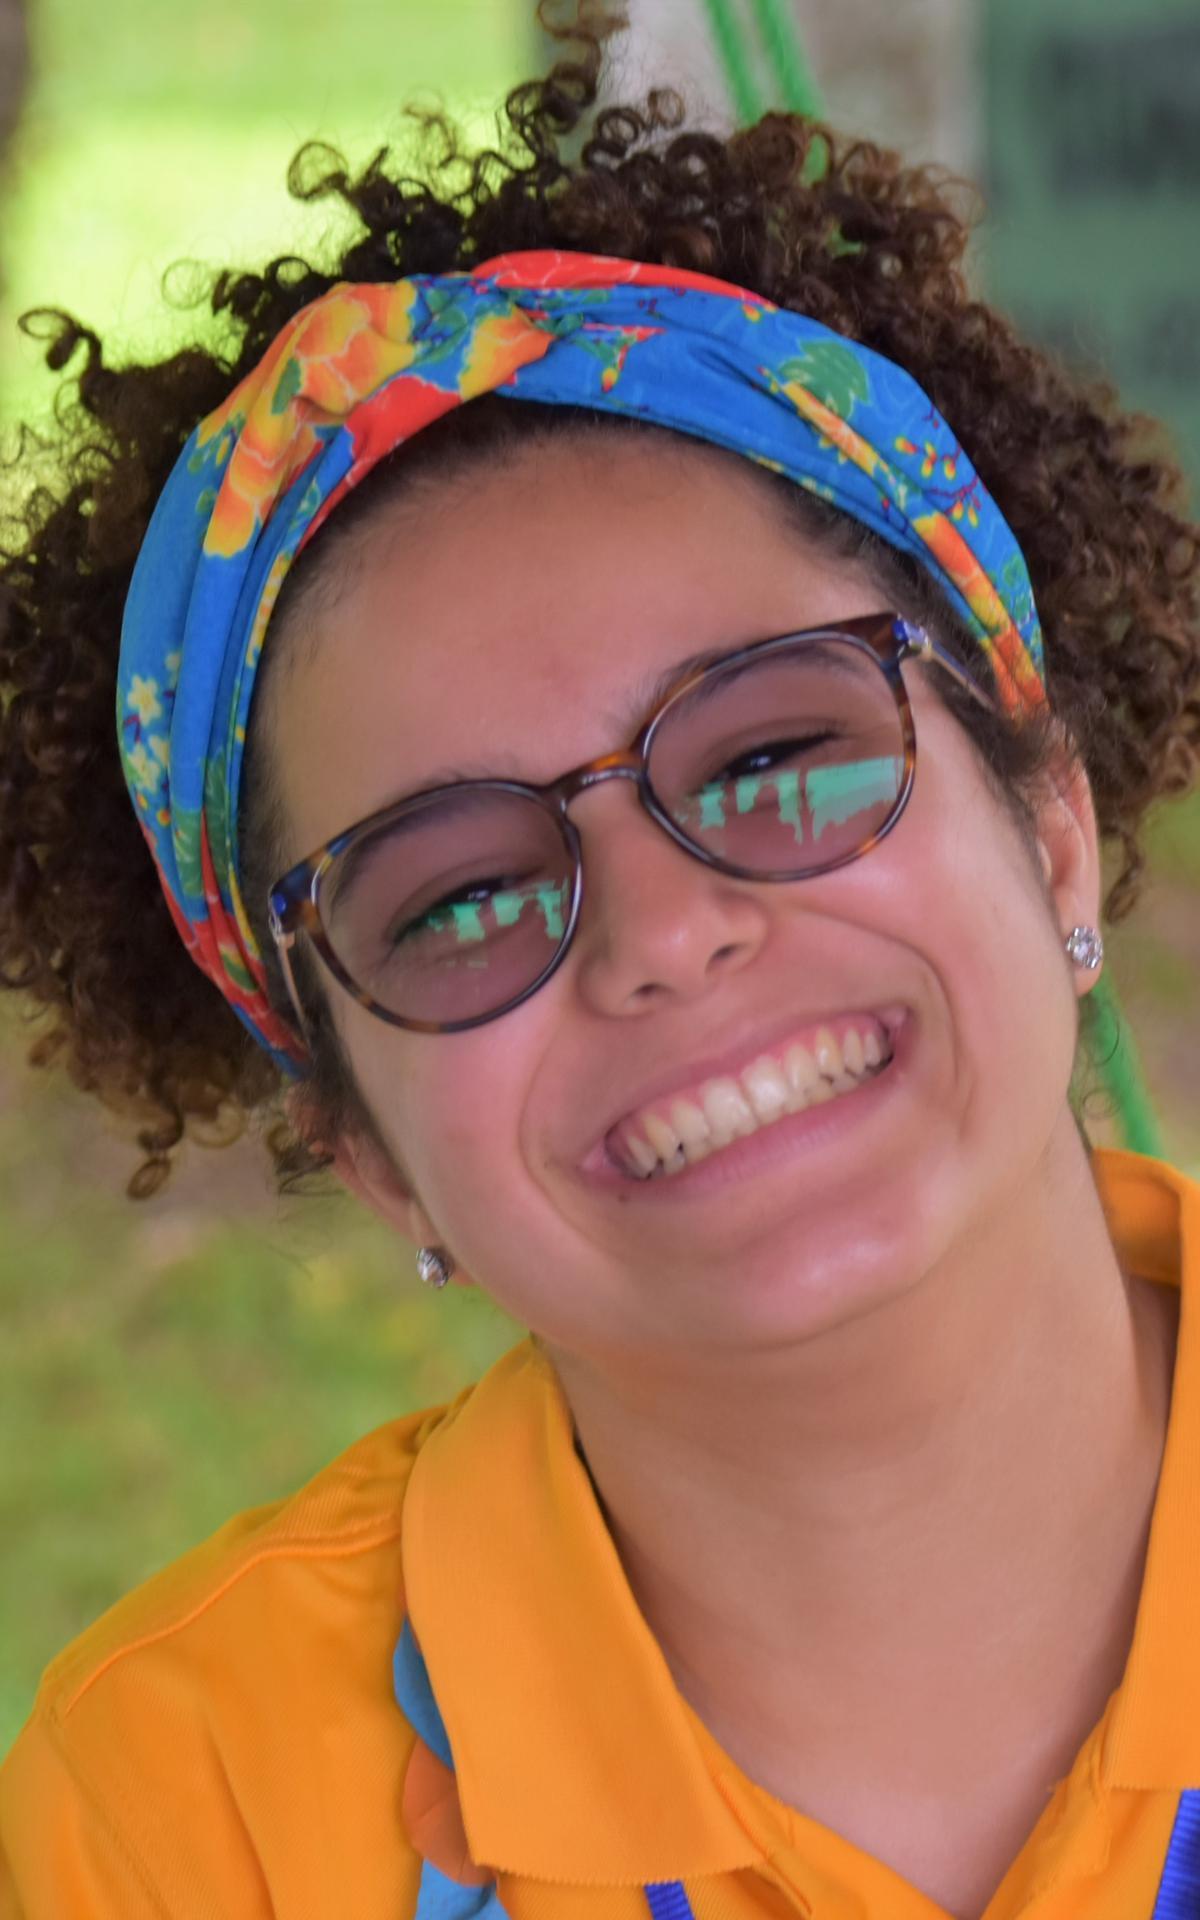 /acp/bc/Caribe Area/Caribe Area/Jovenes/SOY 2018/ESTE/LYR_0081.JPG